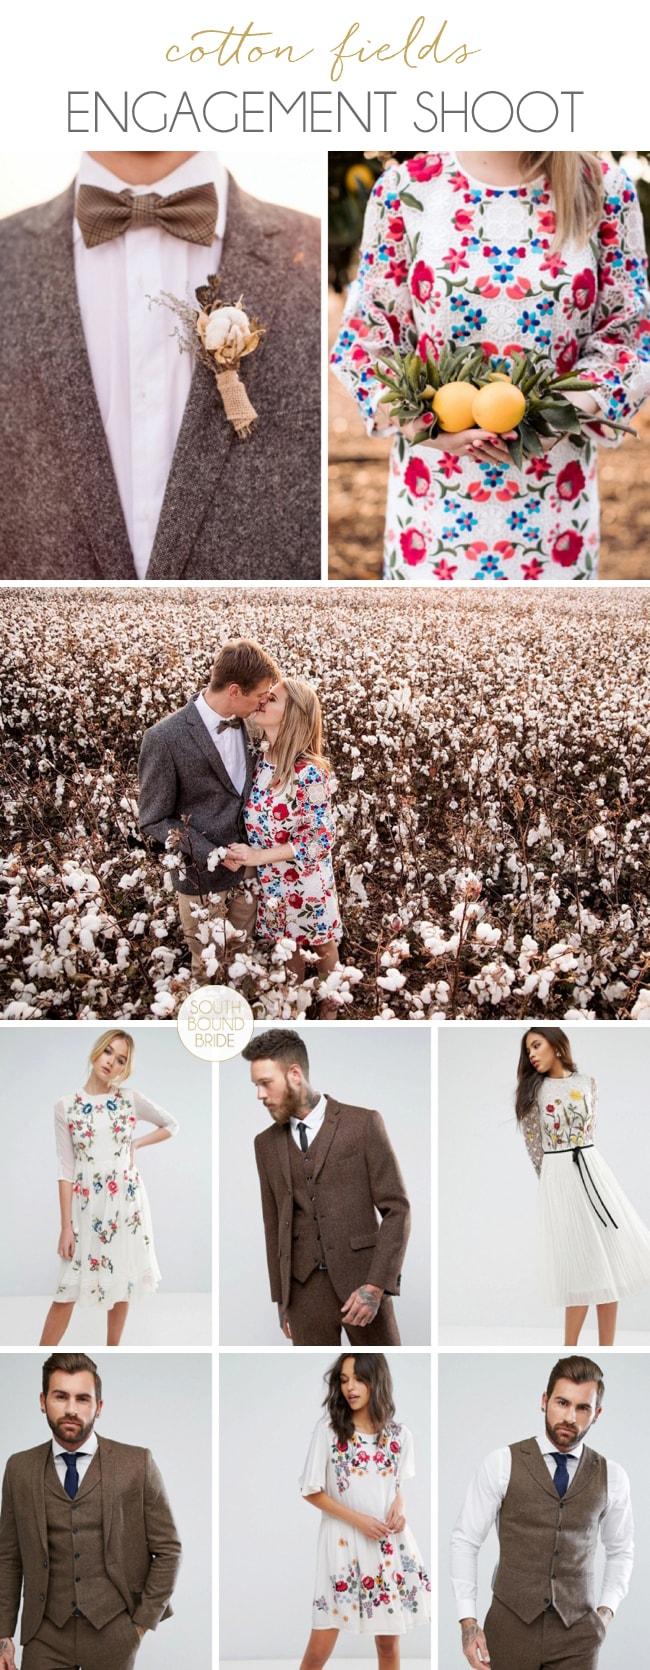 Cotton Fields Engagement Shoot: Shop the Look | SouthBound Bride